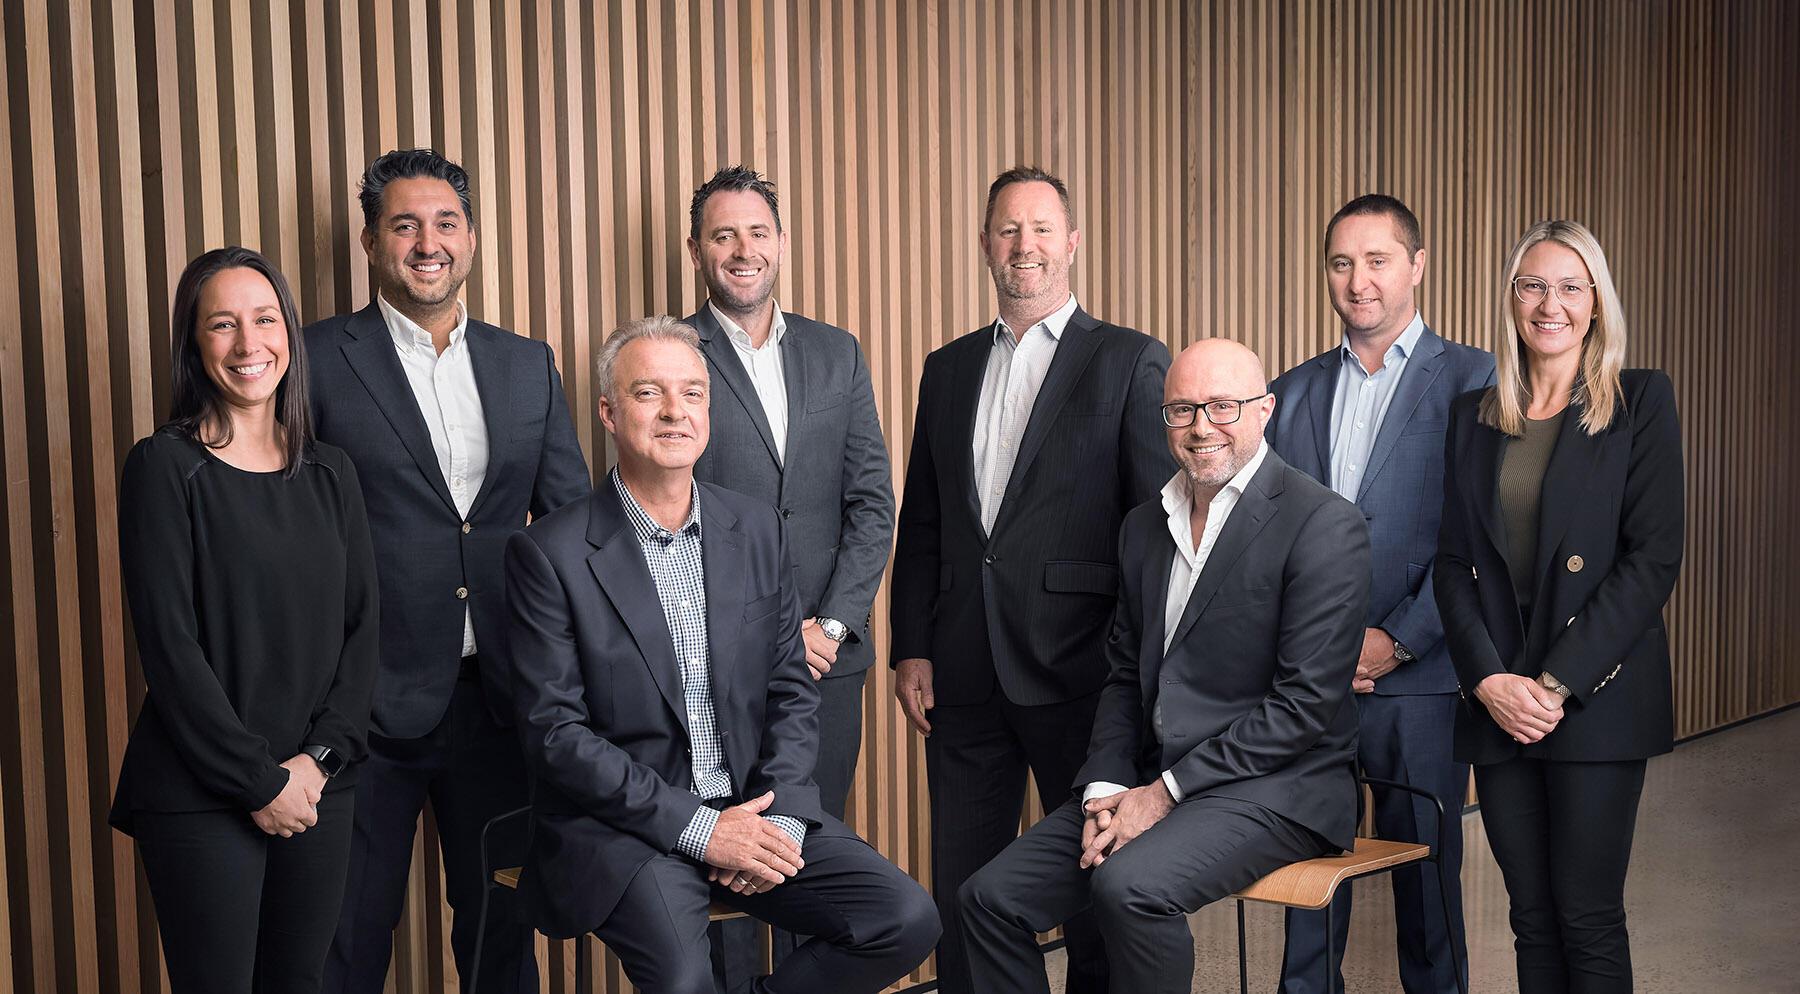 Symal's Leadership Team L-R: Angela Cilia, Joe Bartolo, Michael Lowrie, Ray Dando, Nicholas Murdoch, Nabeel  Sadaka, Andrew Fairbairn, Olivia Bartolo